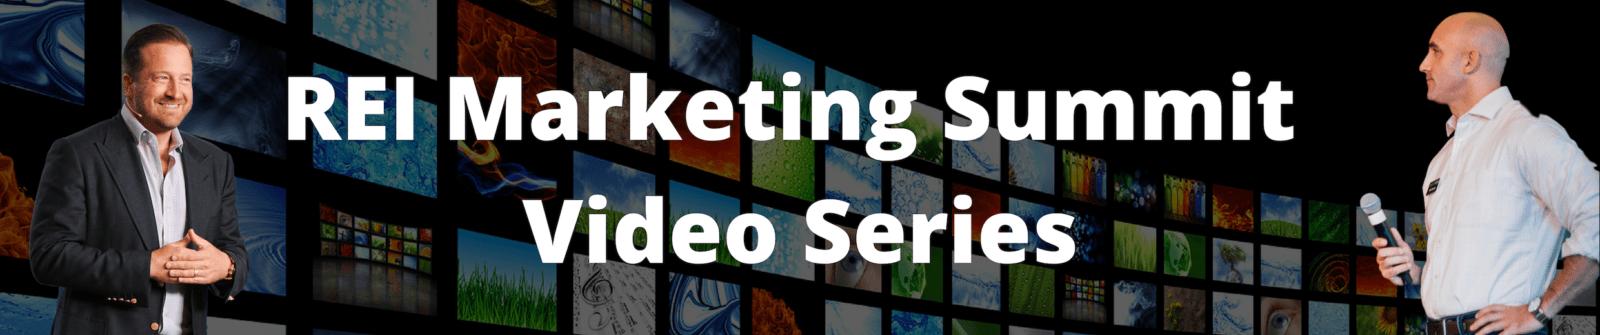 REI Marketing Summit Video Series